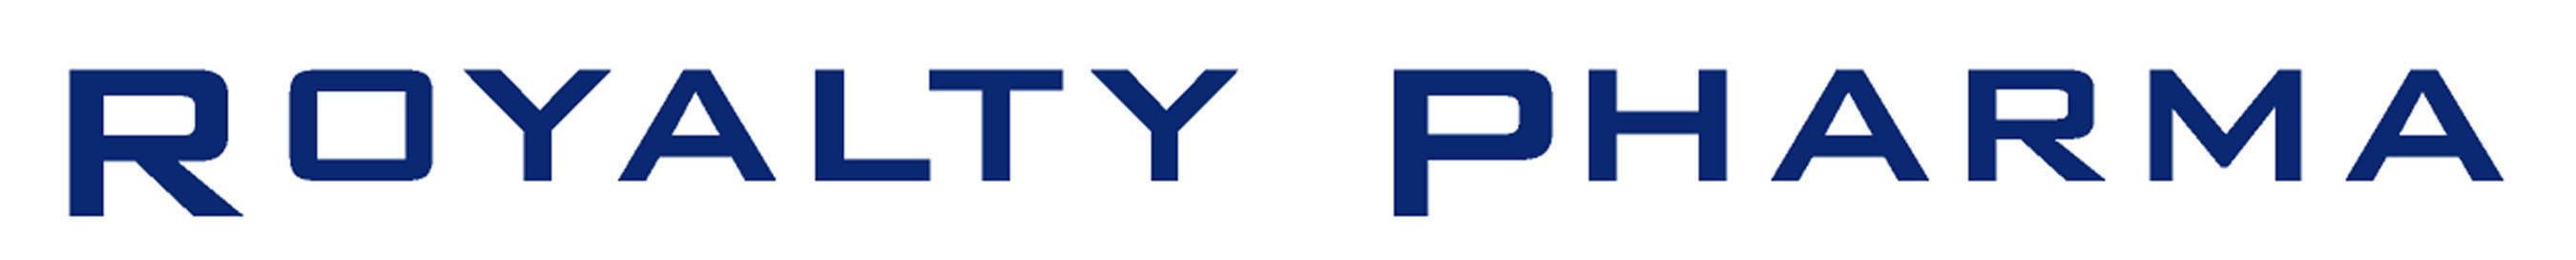 Royalty Pharma. (PRNewsFoto/Royalty Pharma) (PRNewsFoto/)